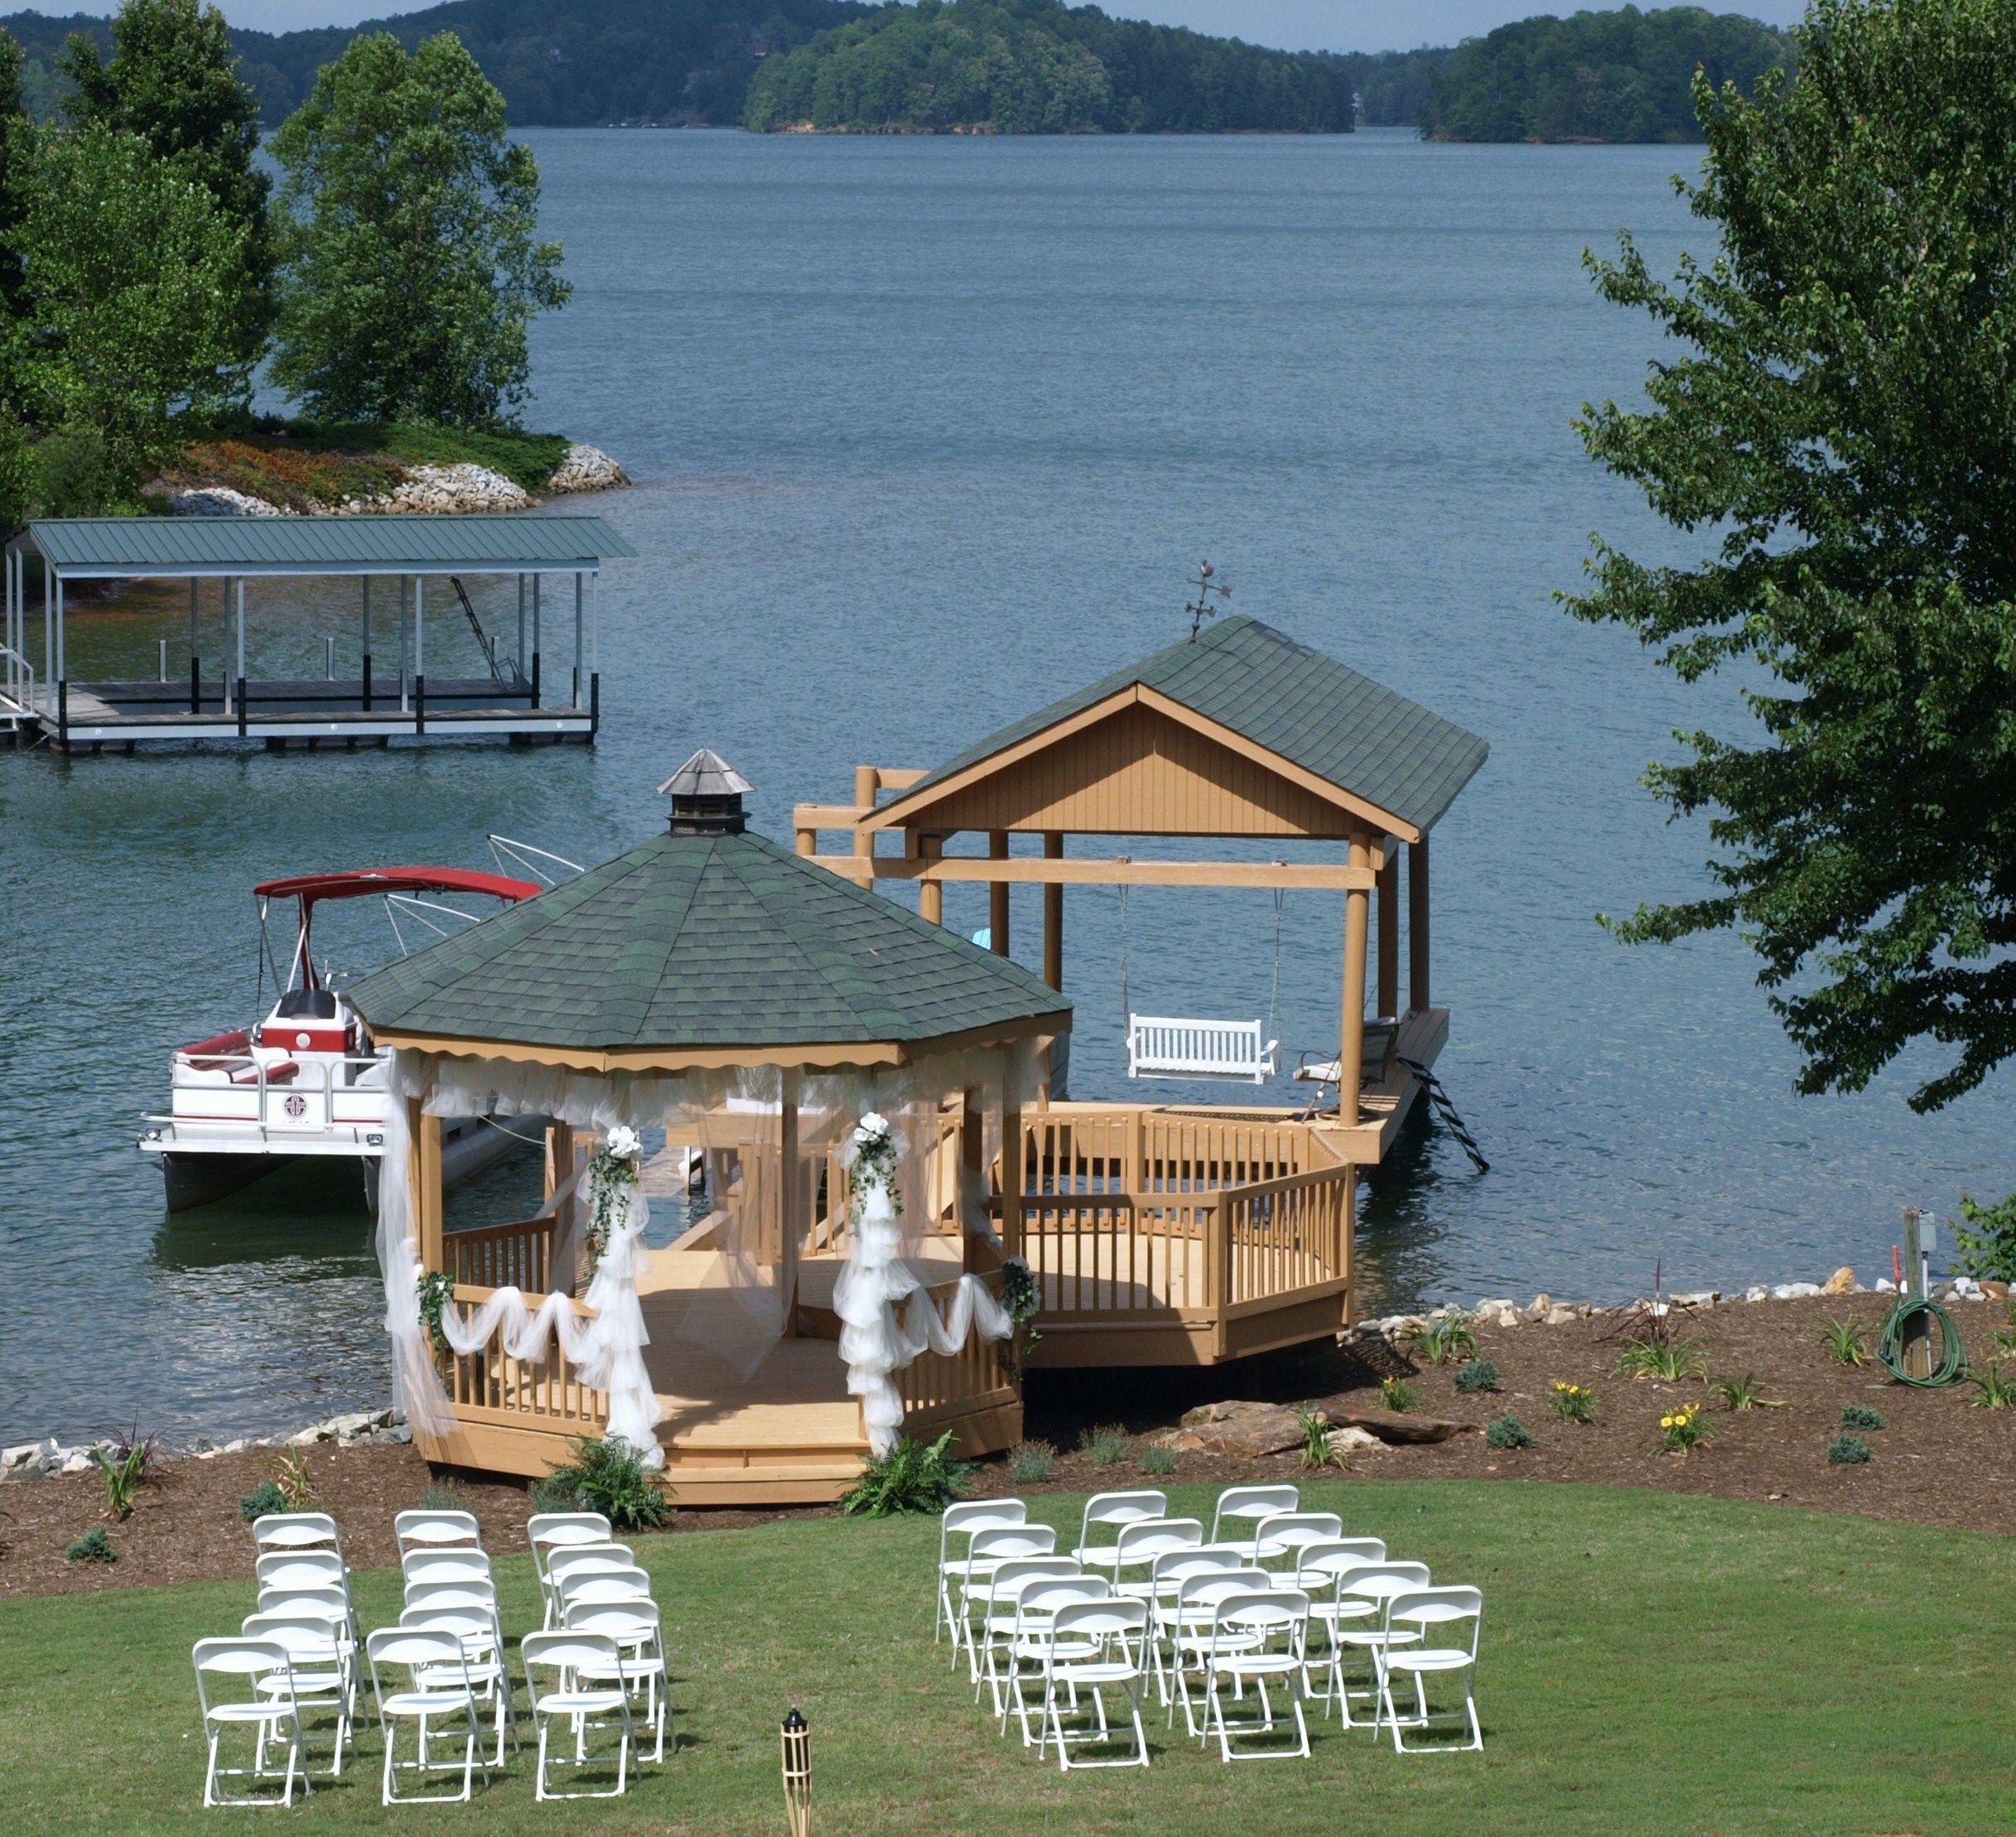 lake keowee house for rent for weddings seneca sc brenda m owen